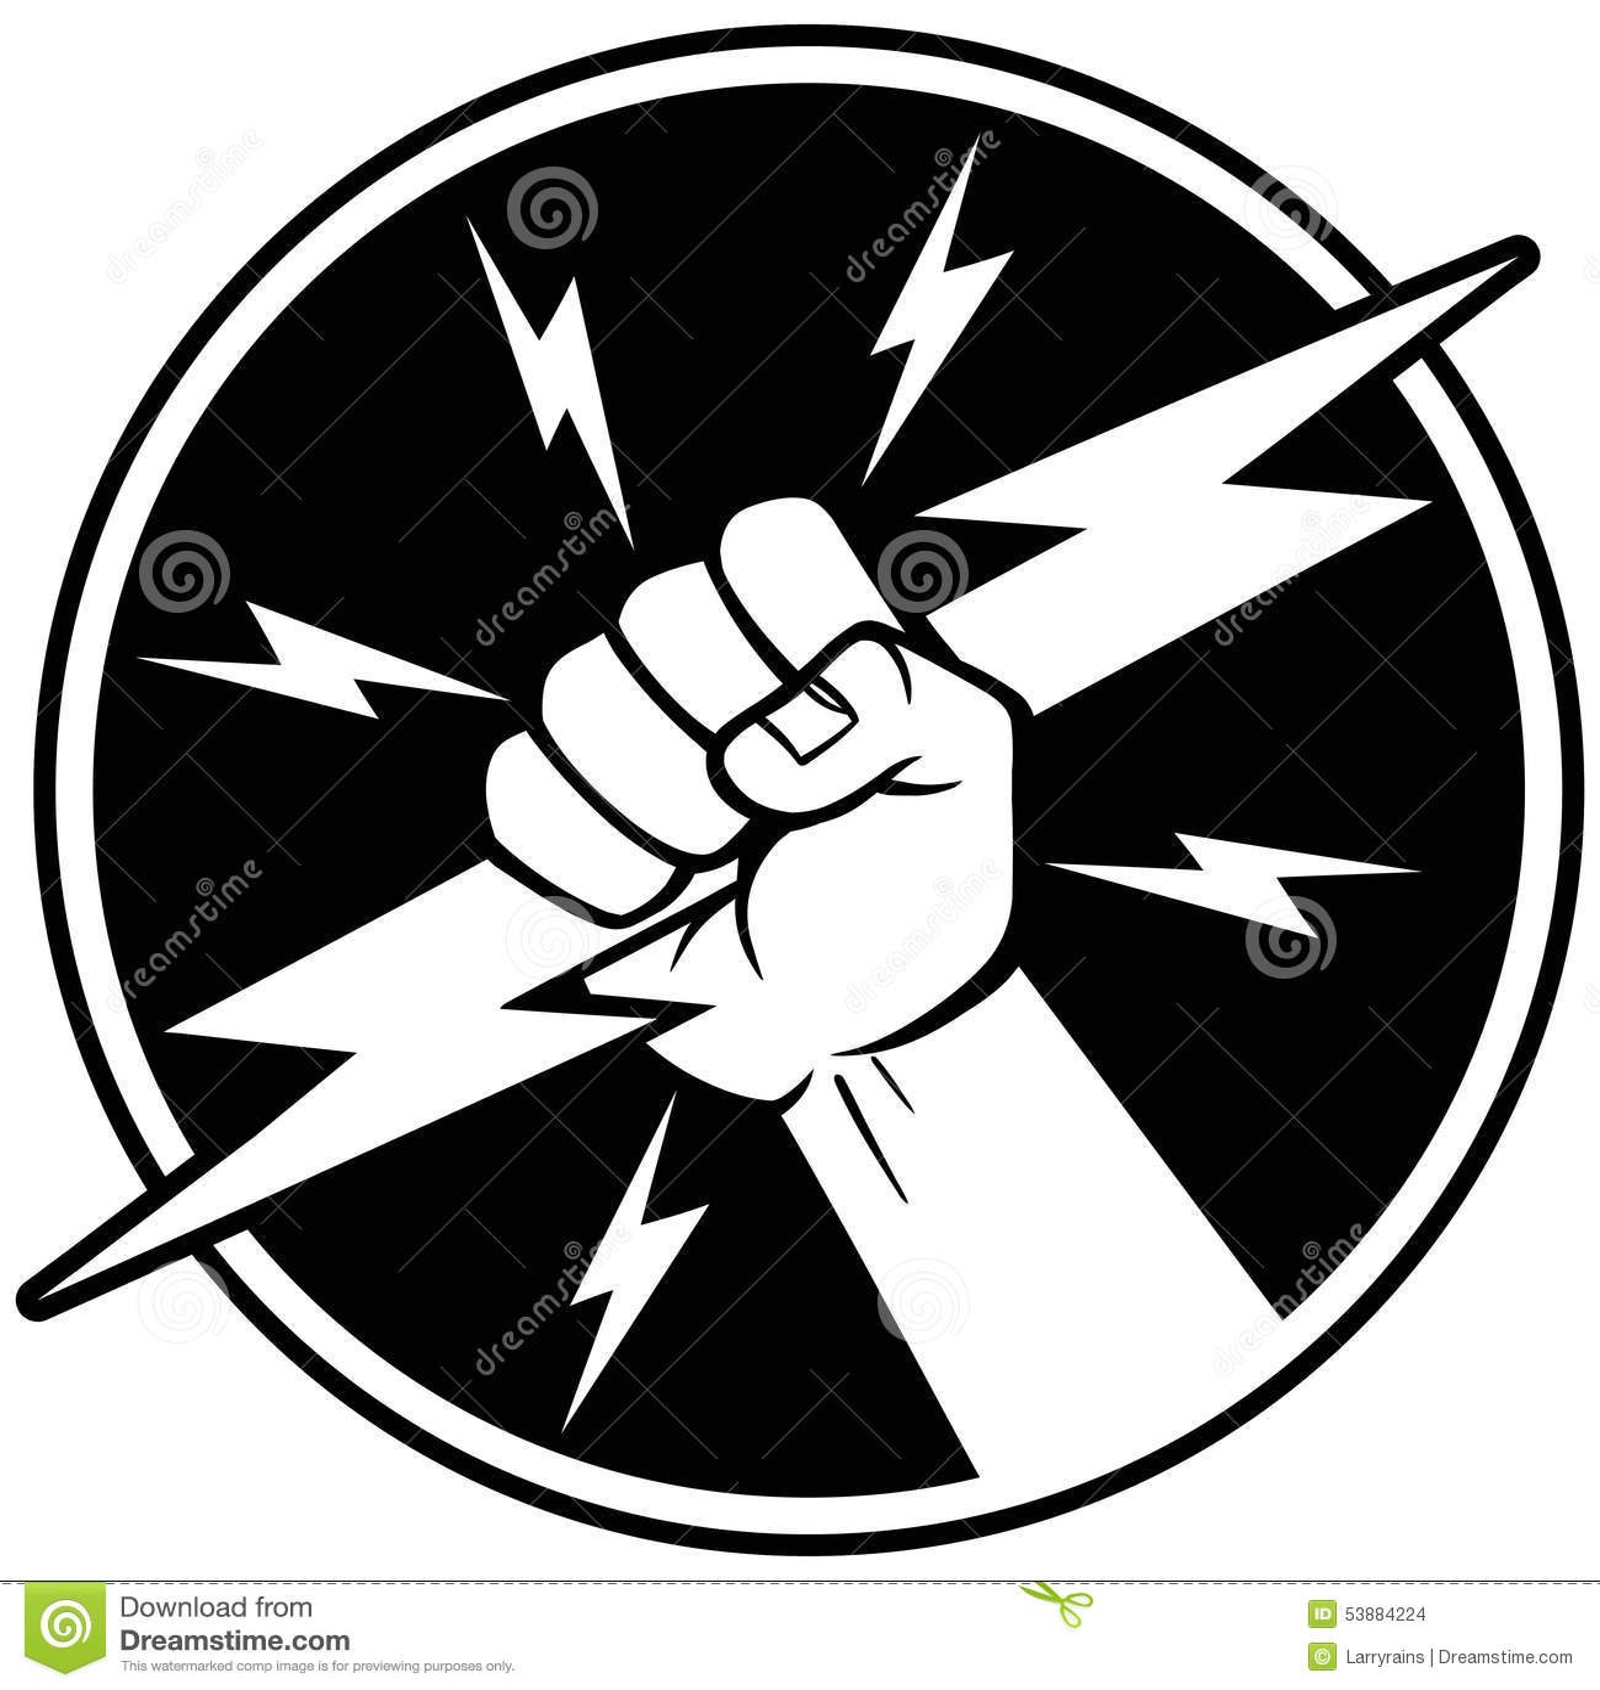 electrician symbol stock vector image 53884224 lasso clip art black and white lasso clip art black and white